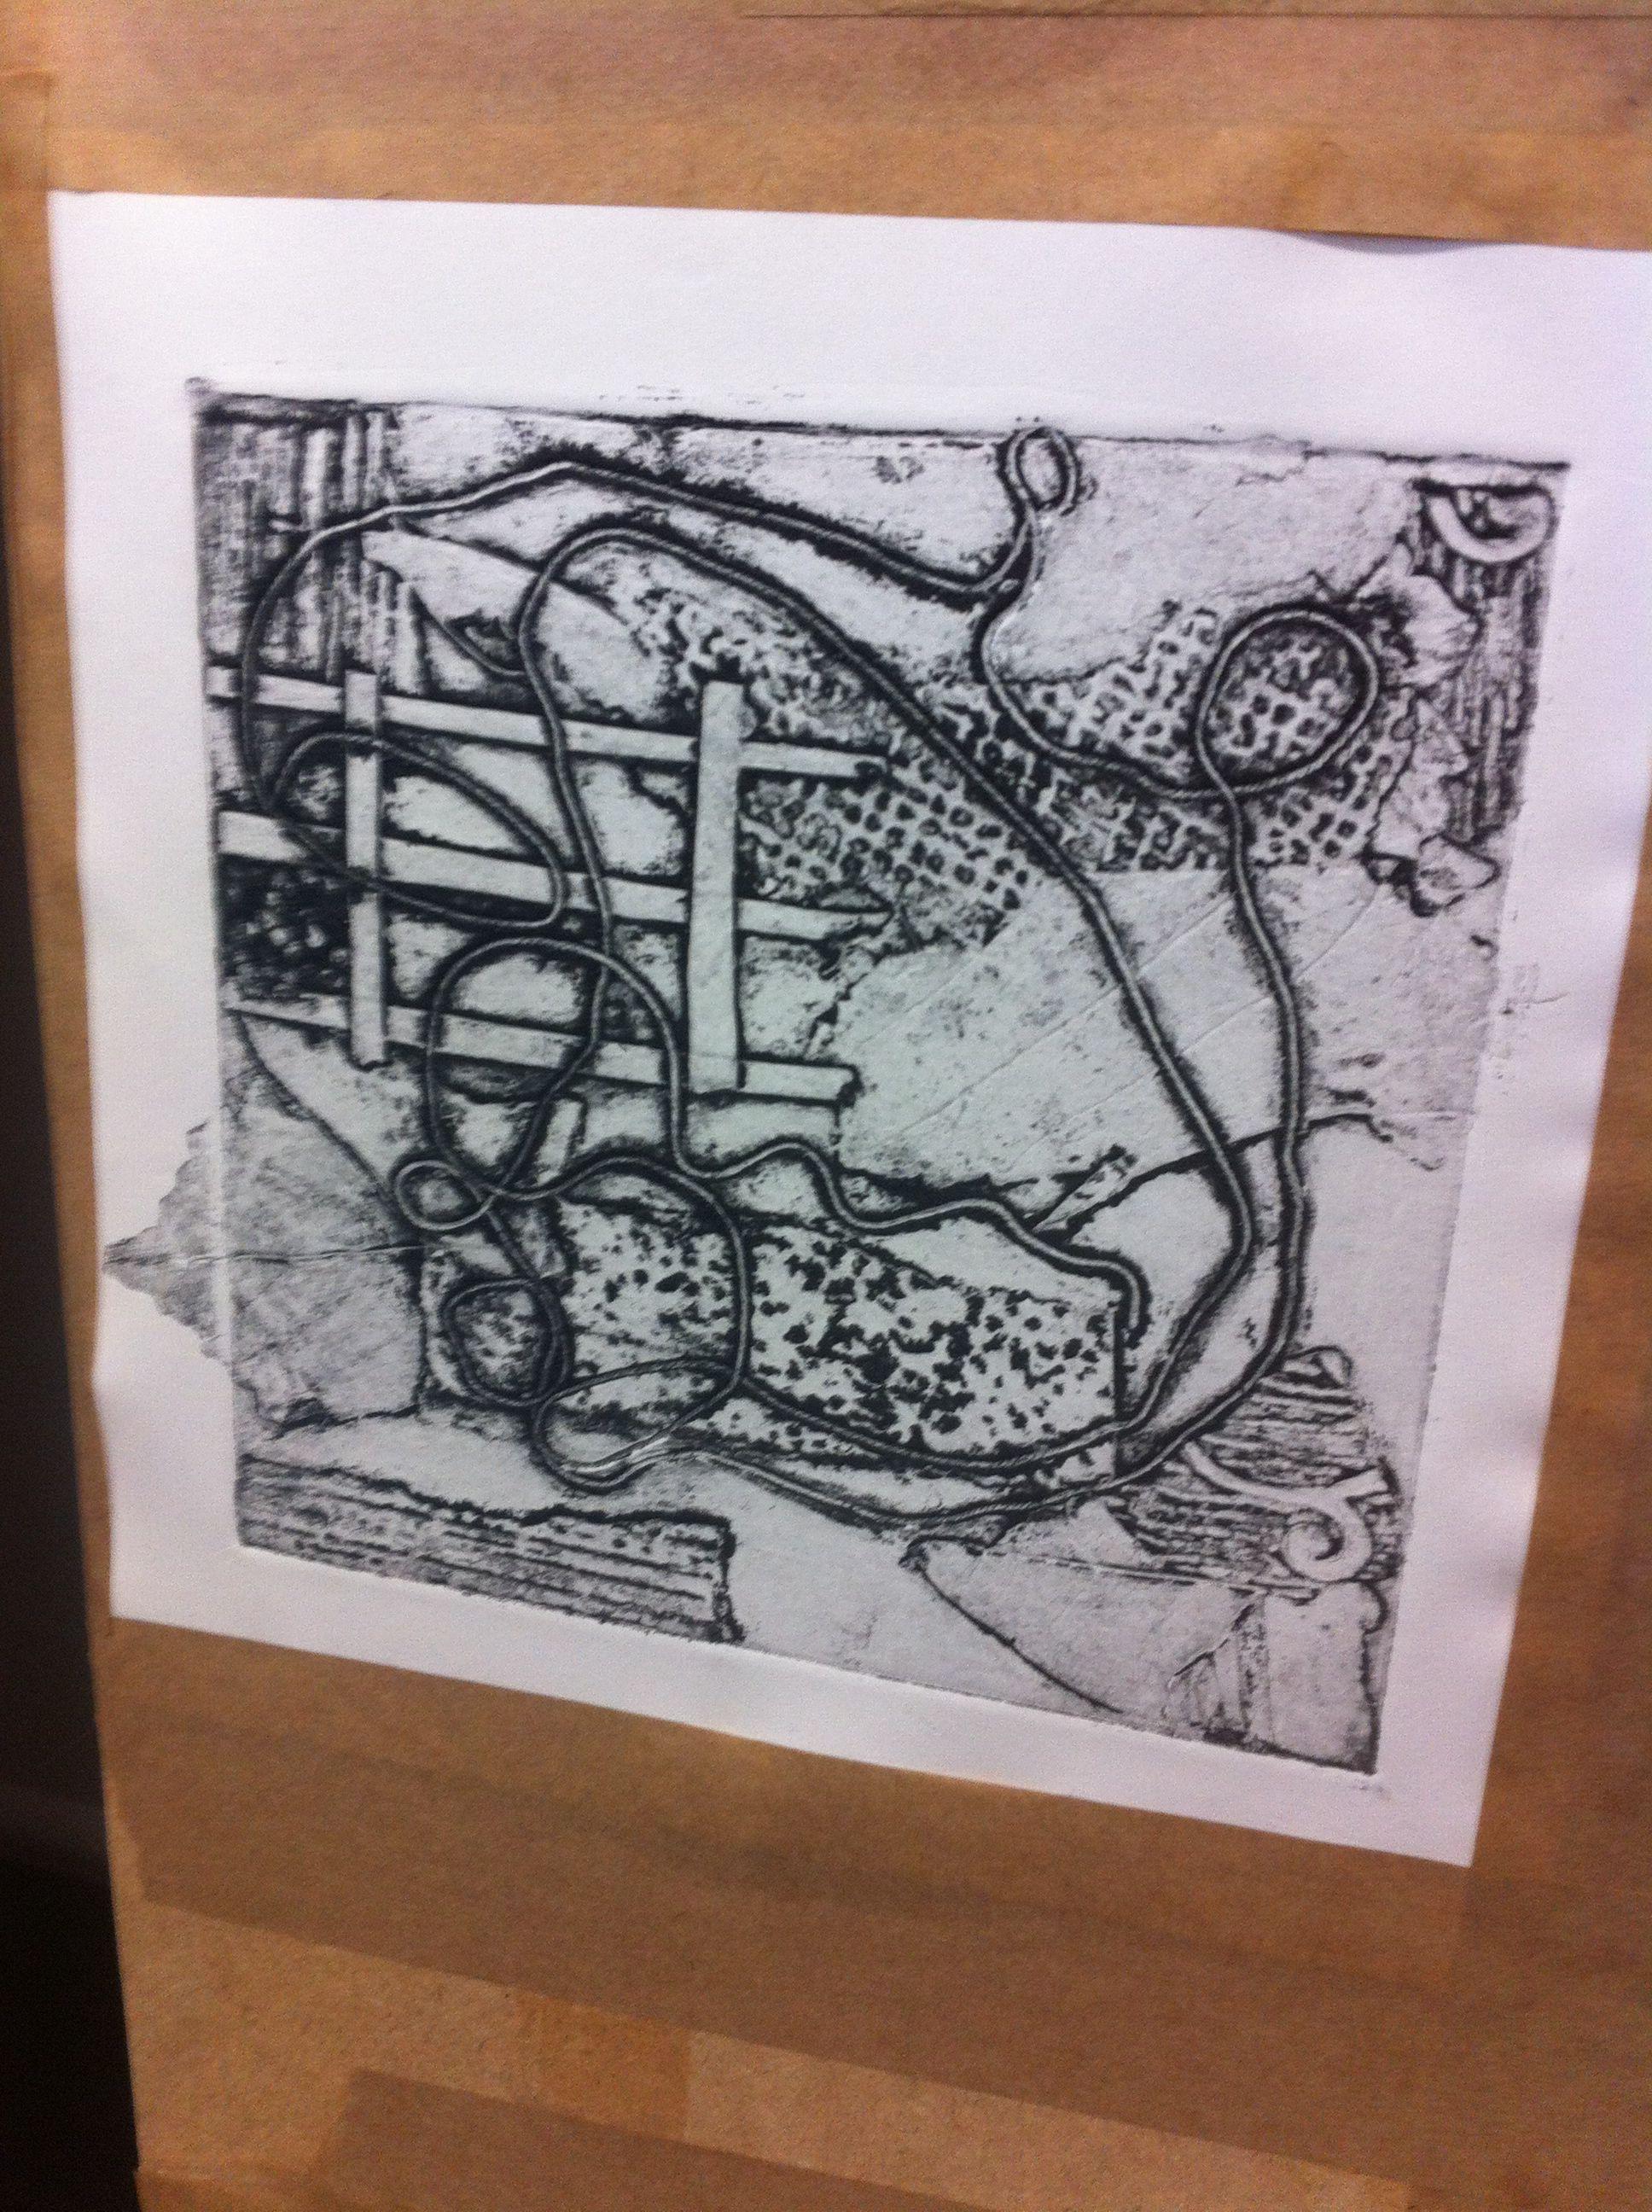 Louise's print